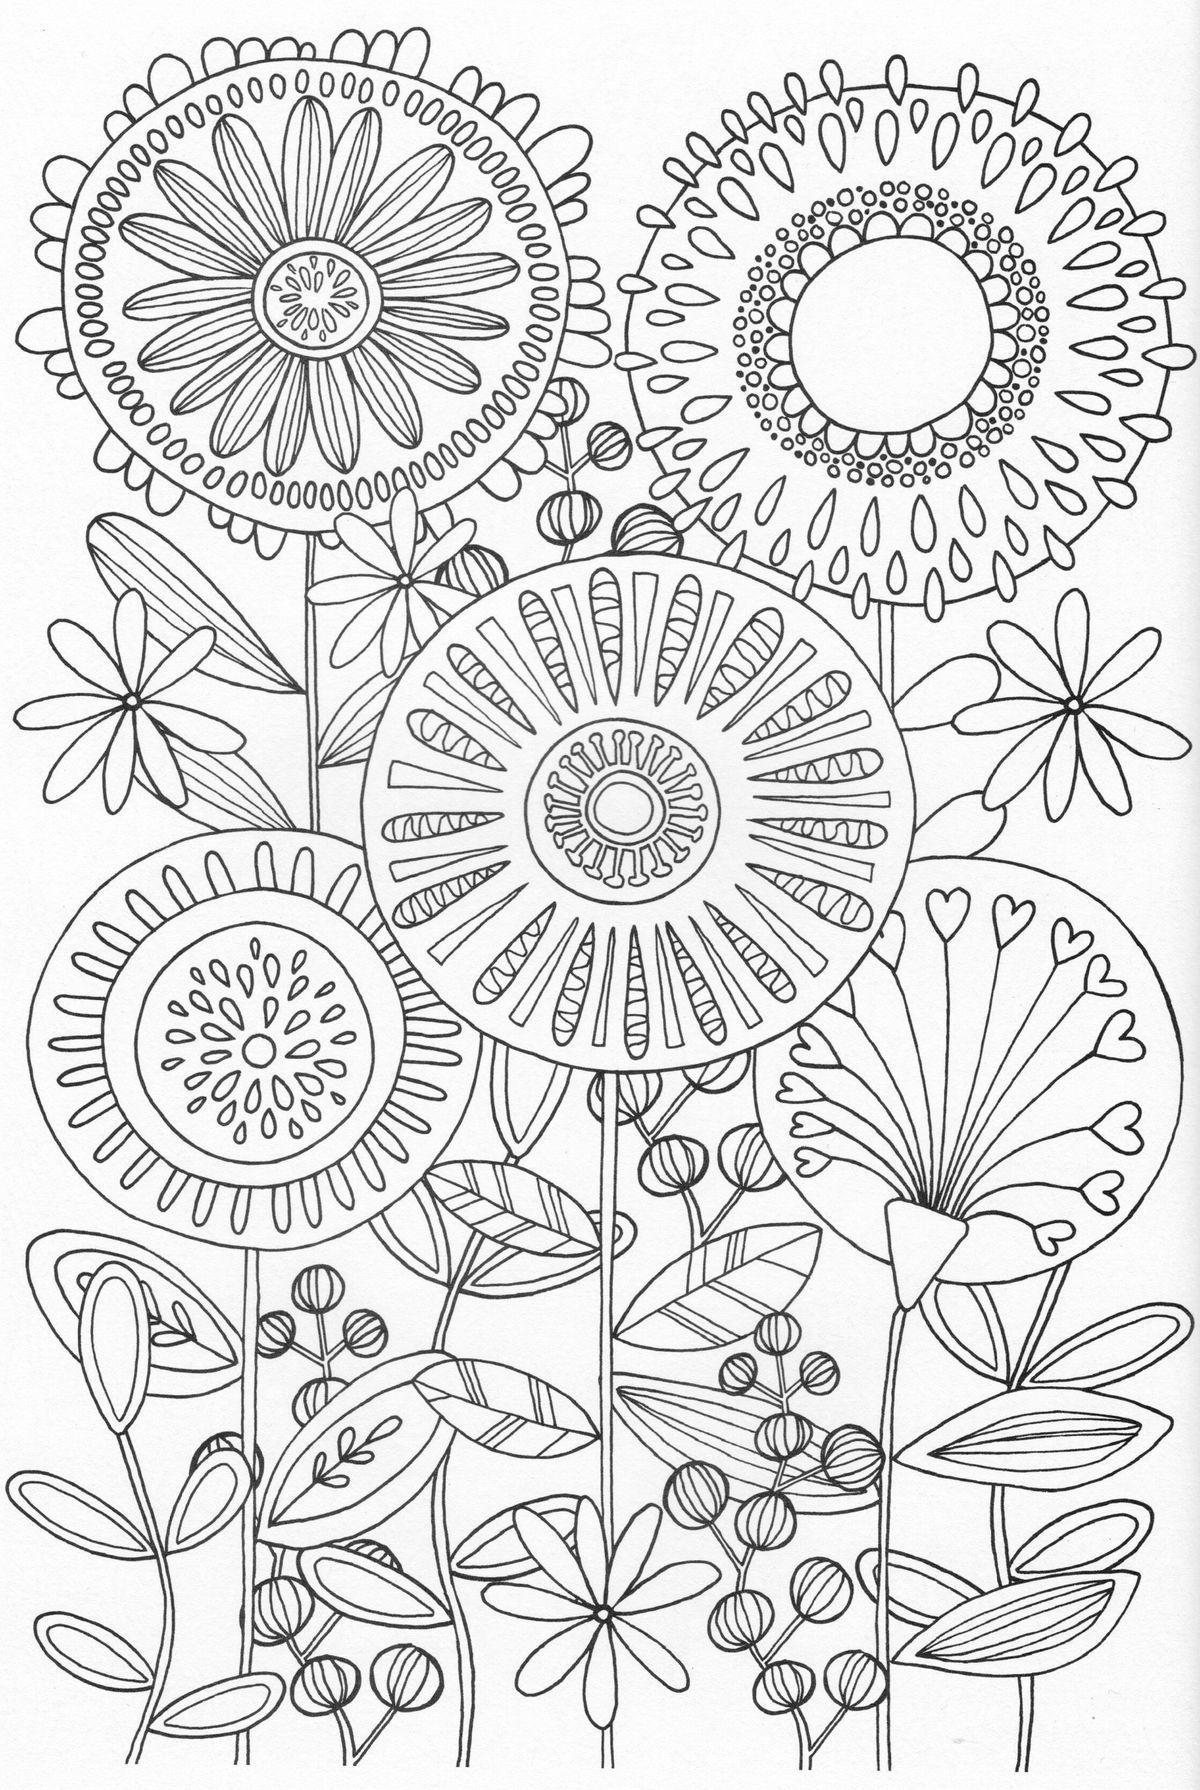 Scandinavian Coloring Book Pg 31 | Pyro-Flowers/Leaves | Pinterest ...